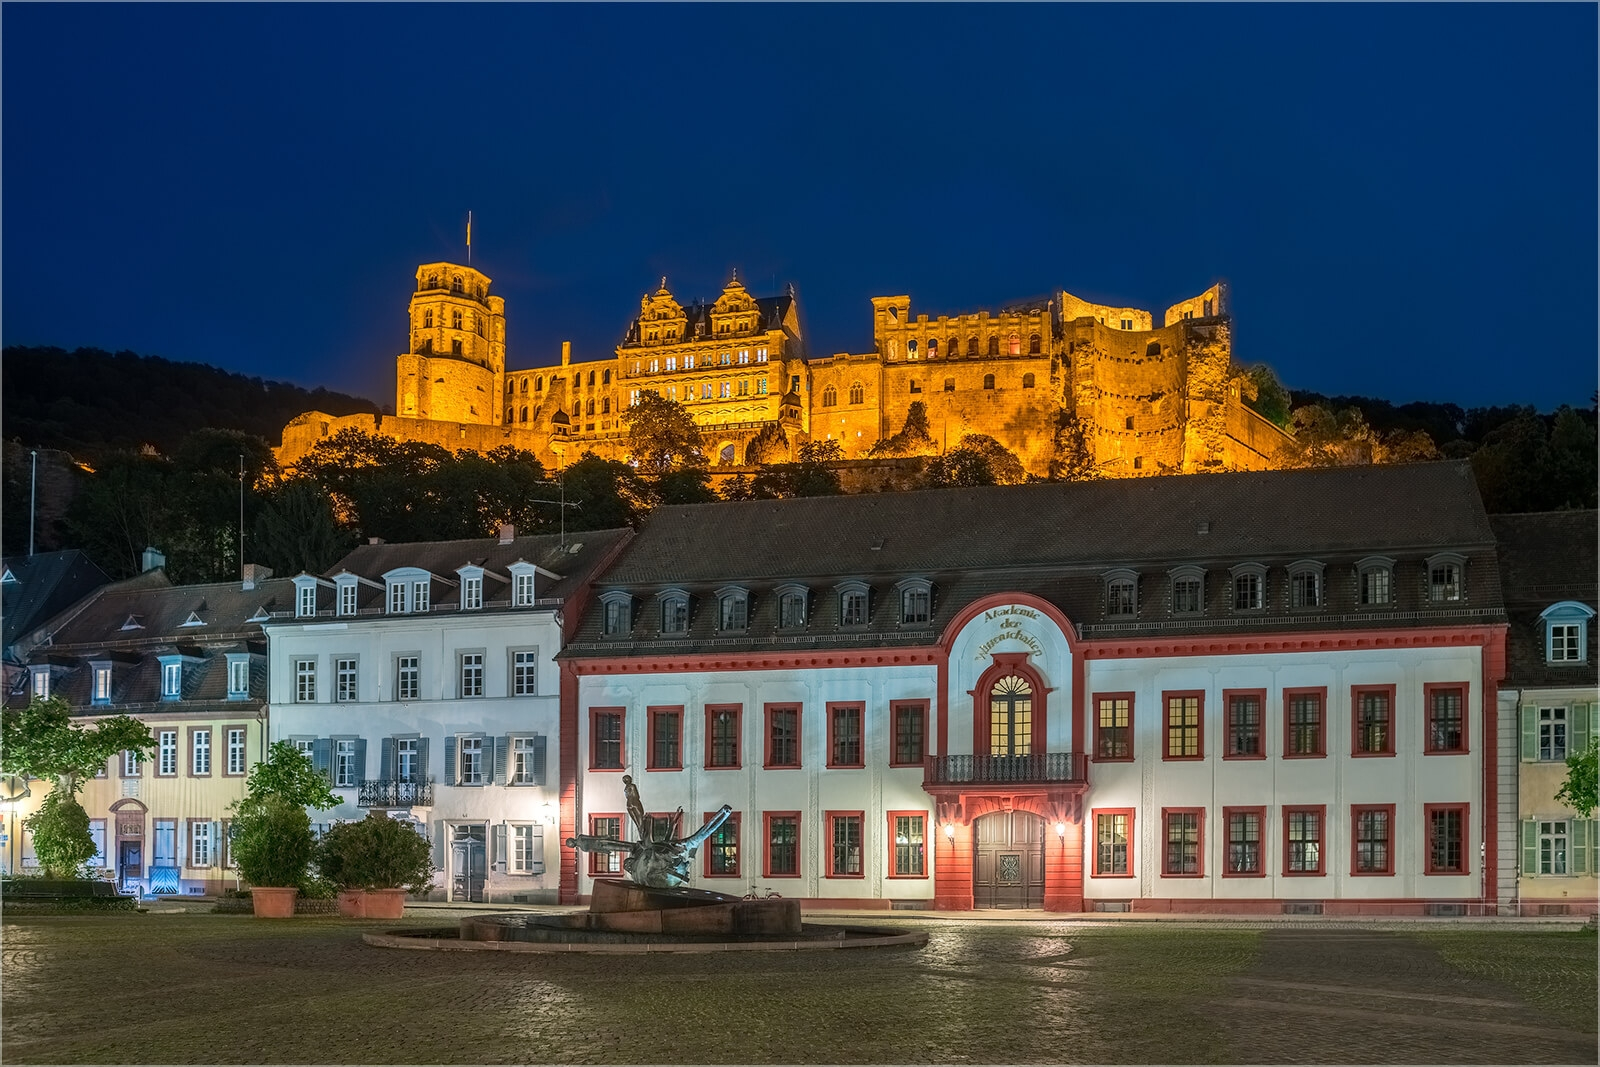 Wanddeko Heidelberg am Karlsplatz